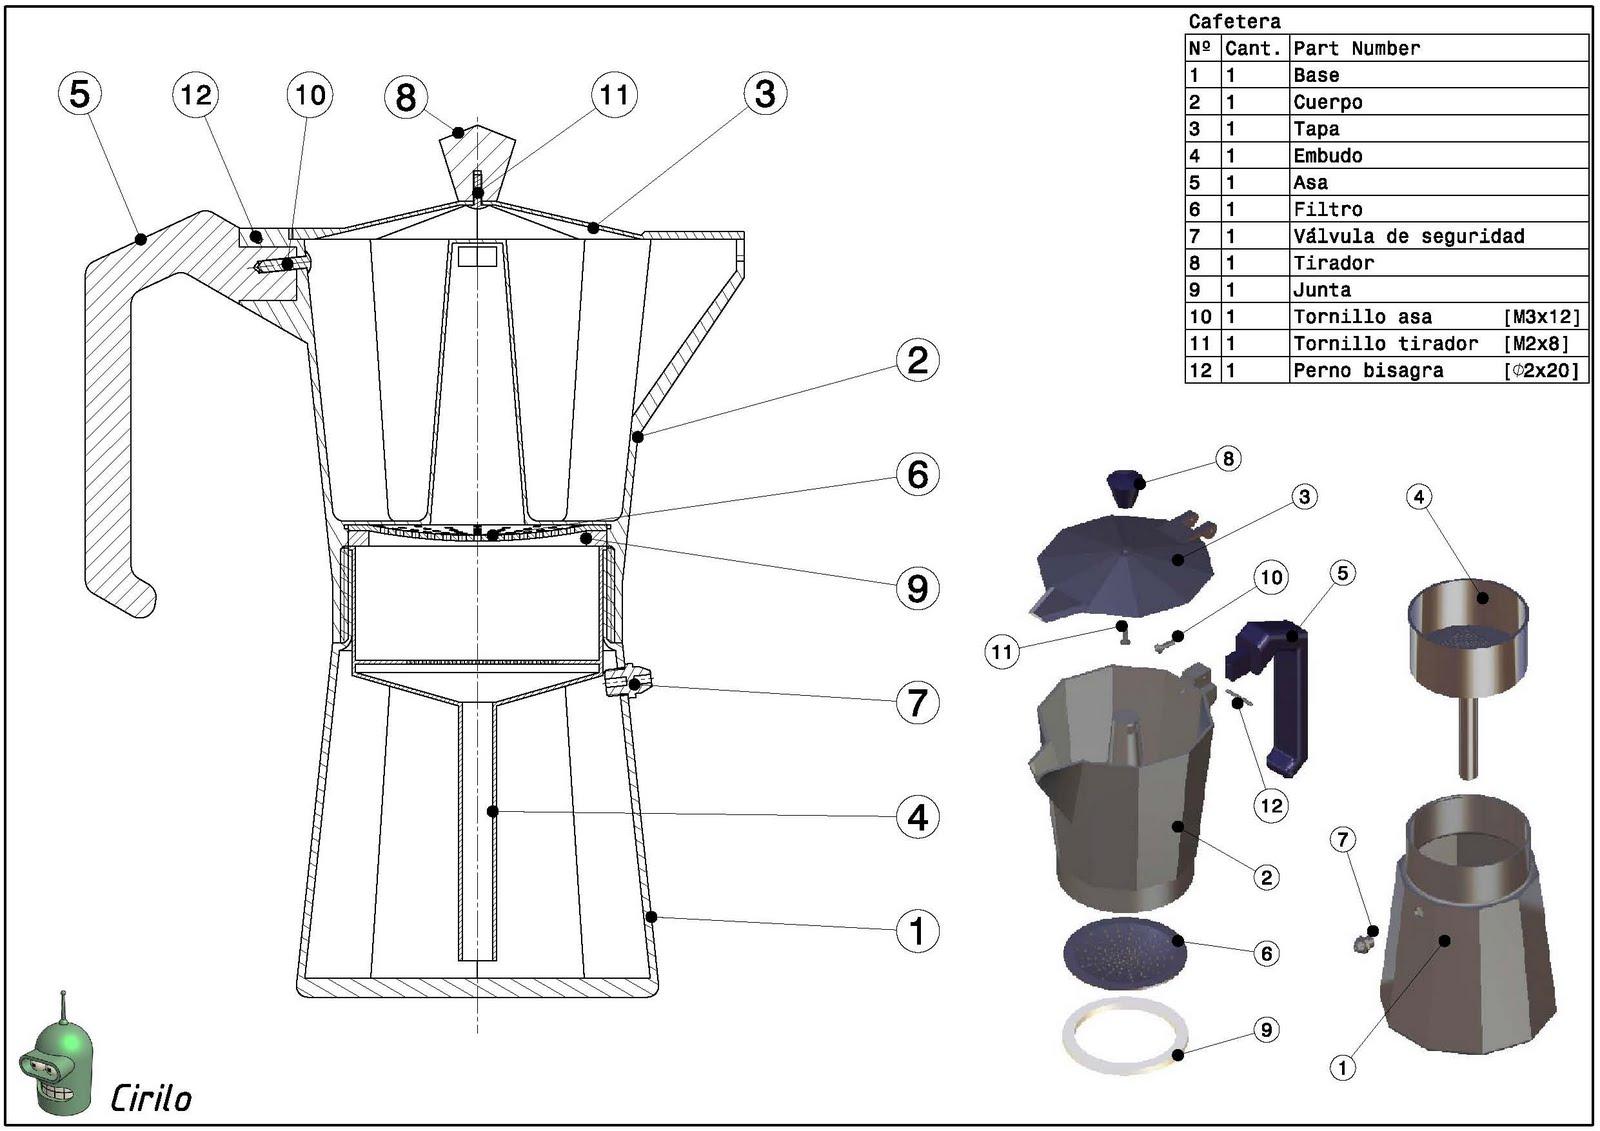 Planos con ciri cafetera for Planos silla ergonomica pdf